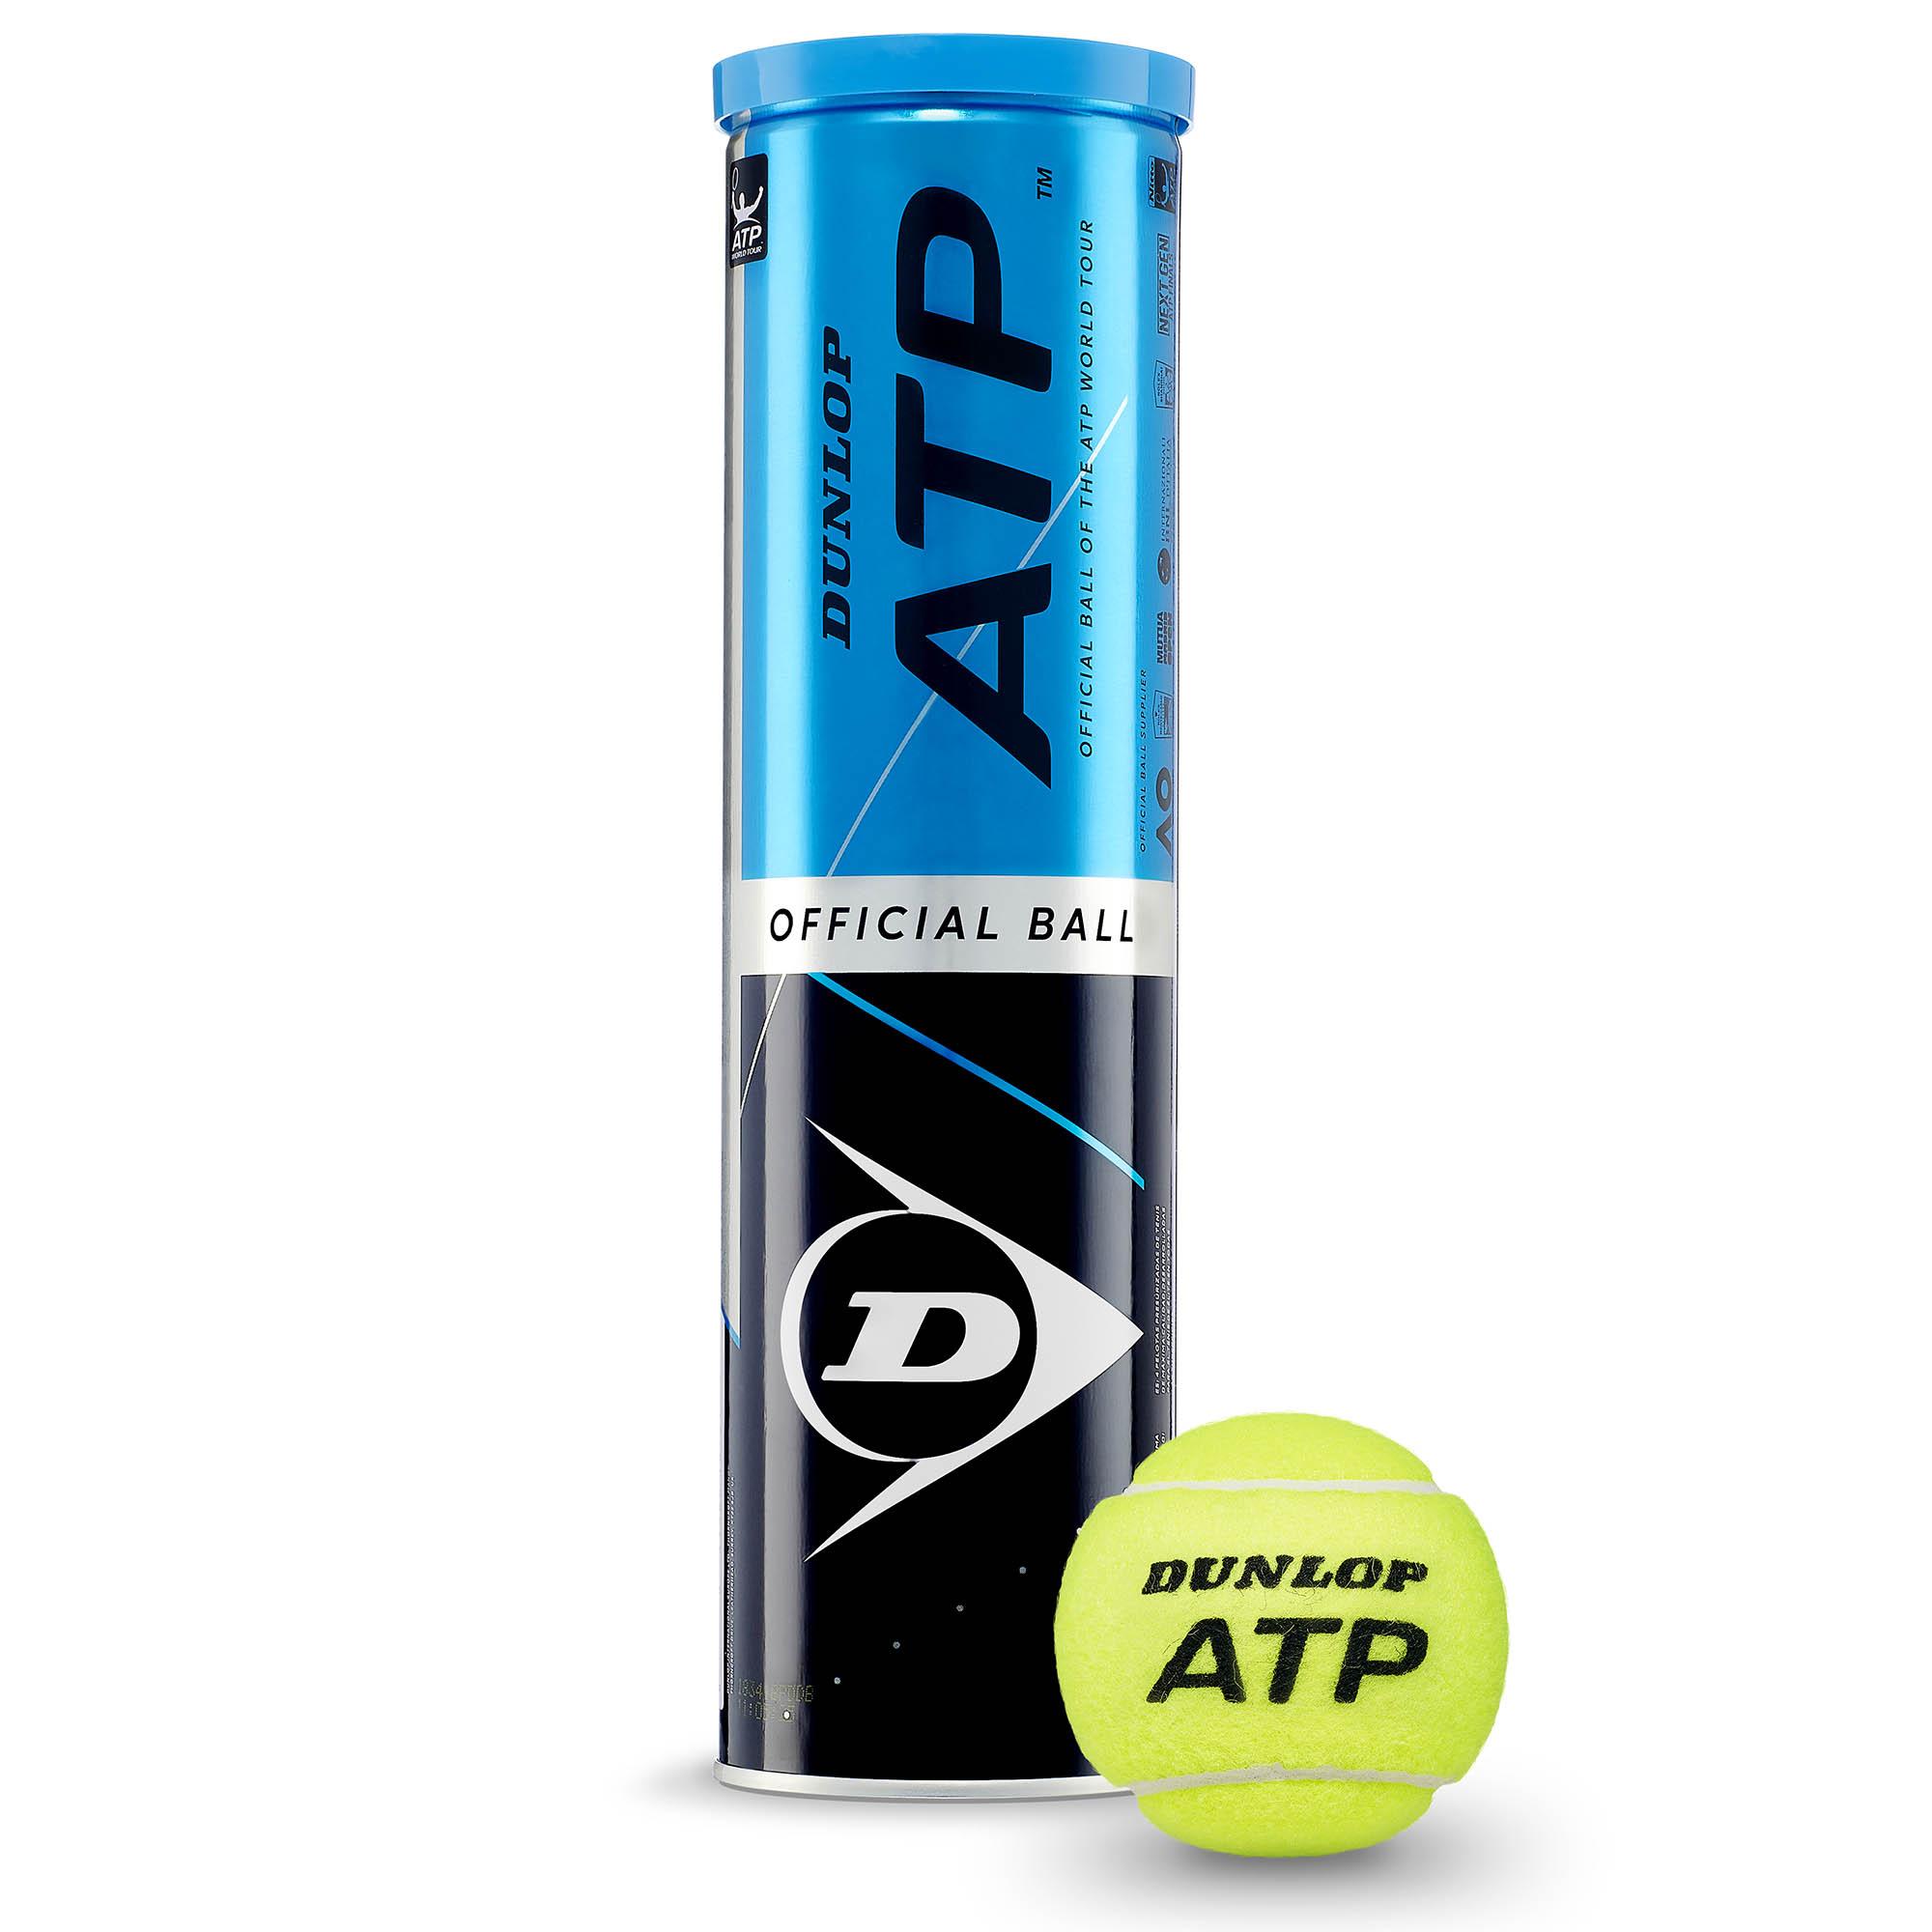 Image of Dunlop ATP Official Tennis Balls